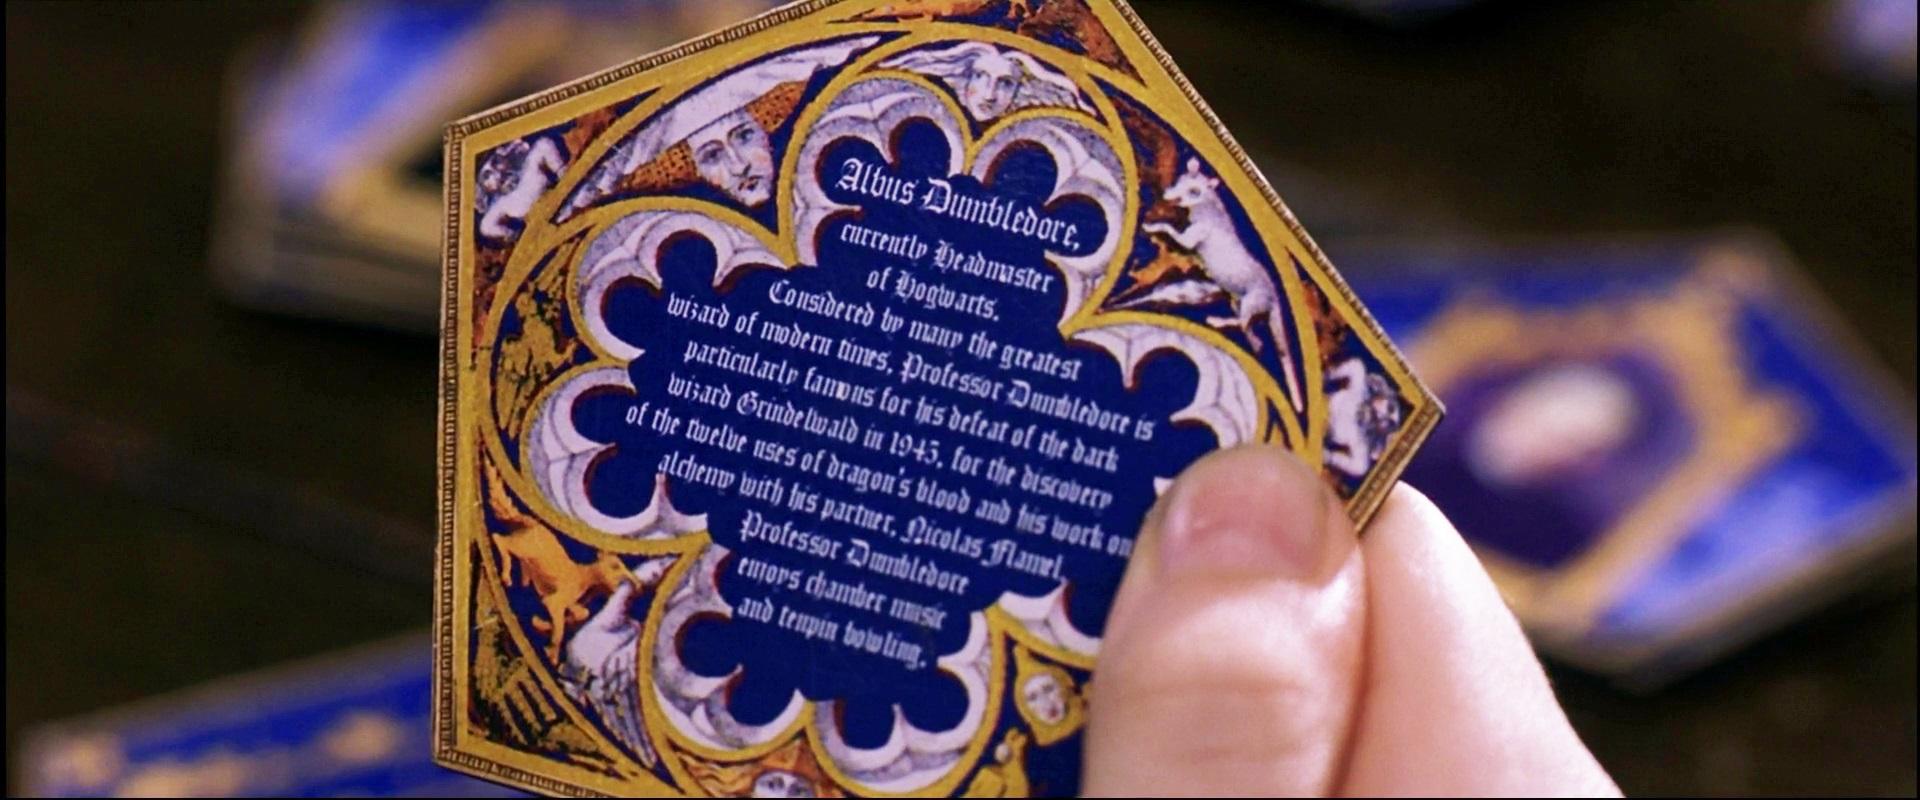 Albus Dumbledore (Famous Wizard Card).jpg